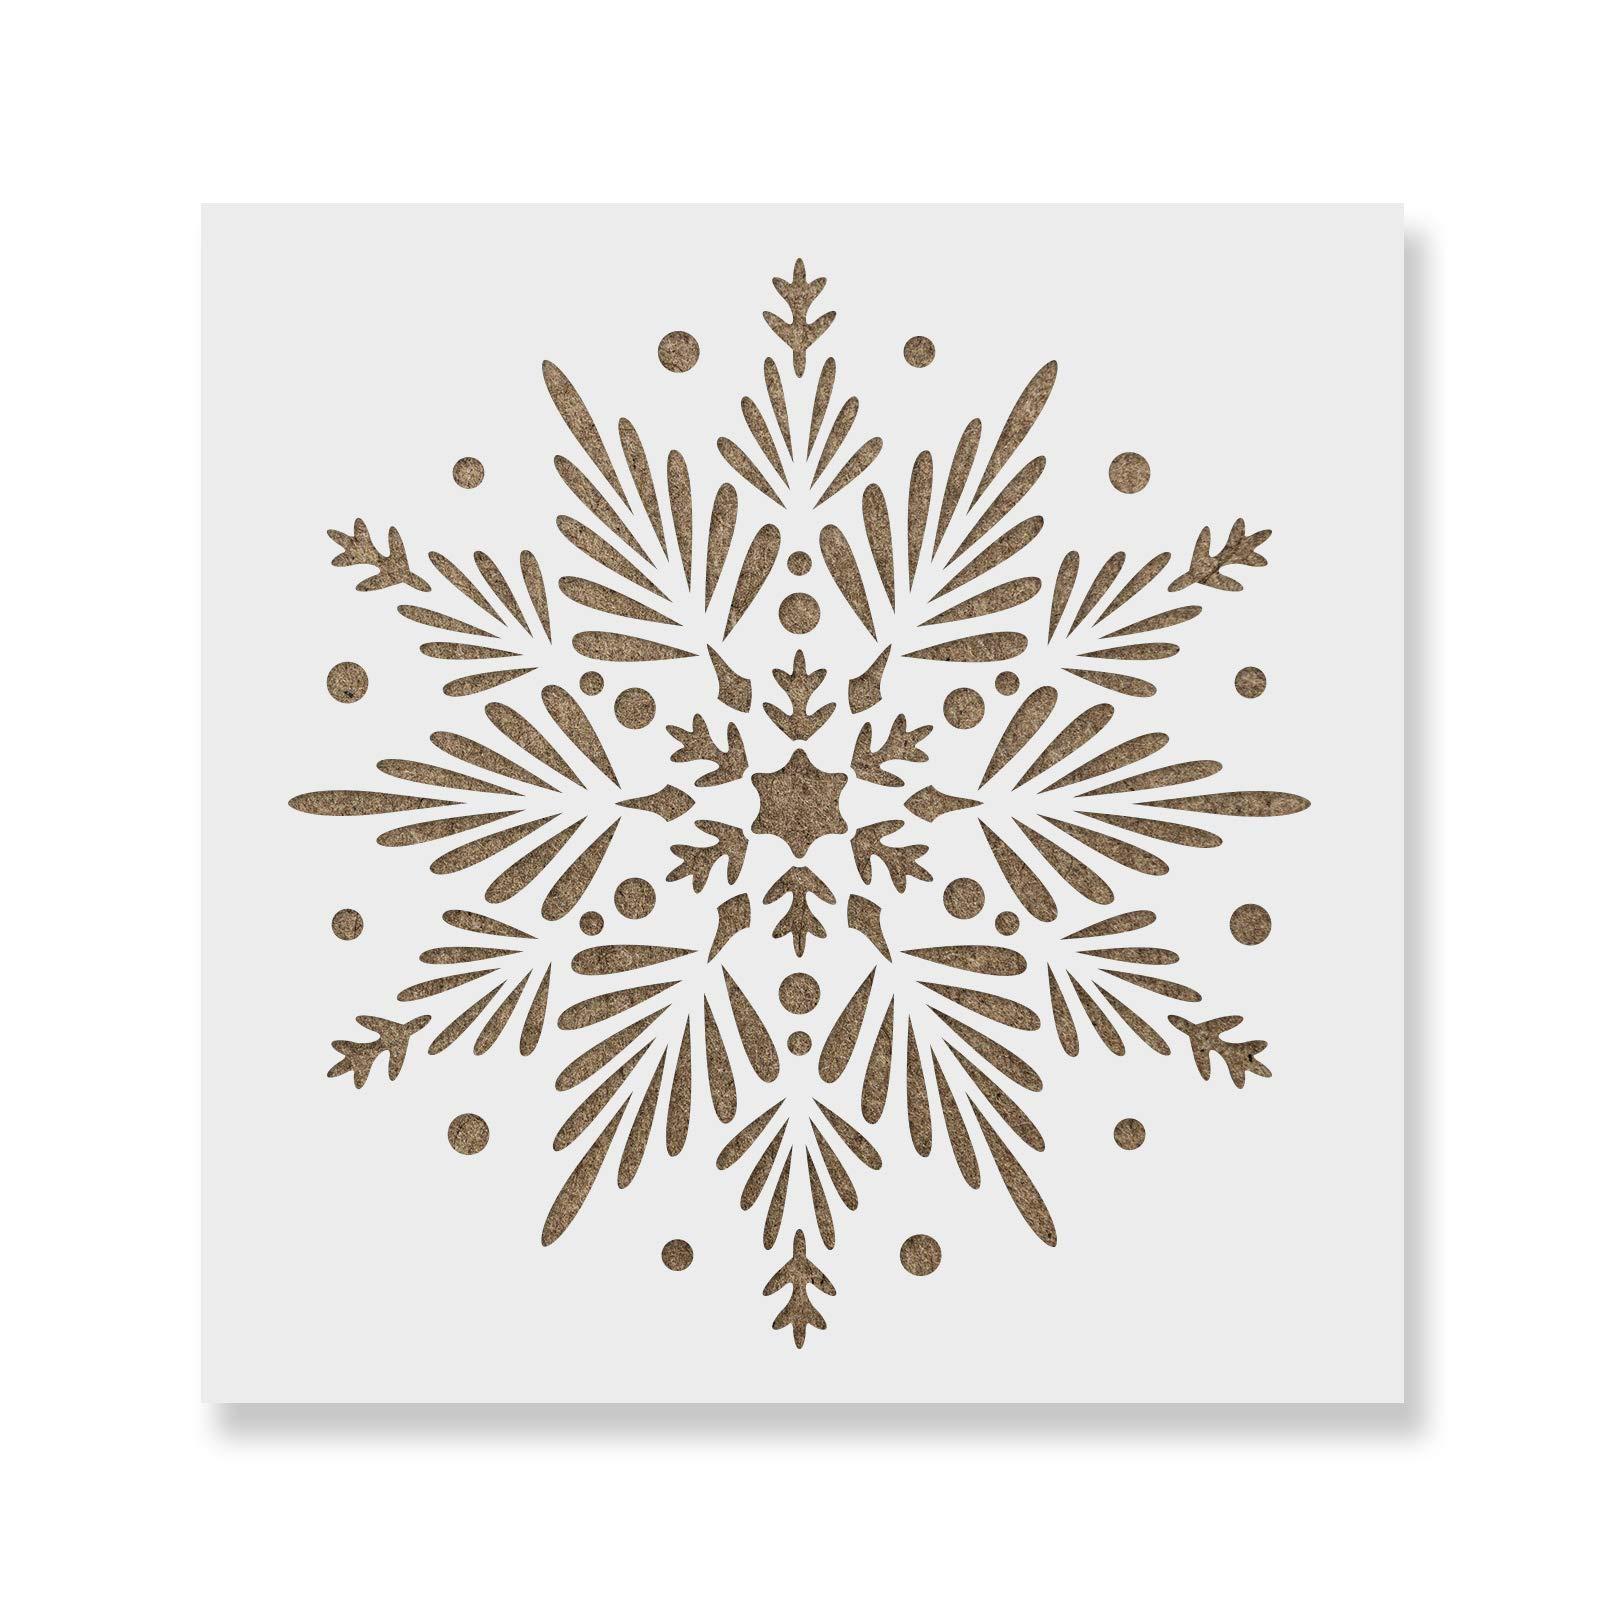 Snowflake Stencil - Reusable & Durable Mylar Stencils Made in USA by Stencil Revolution